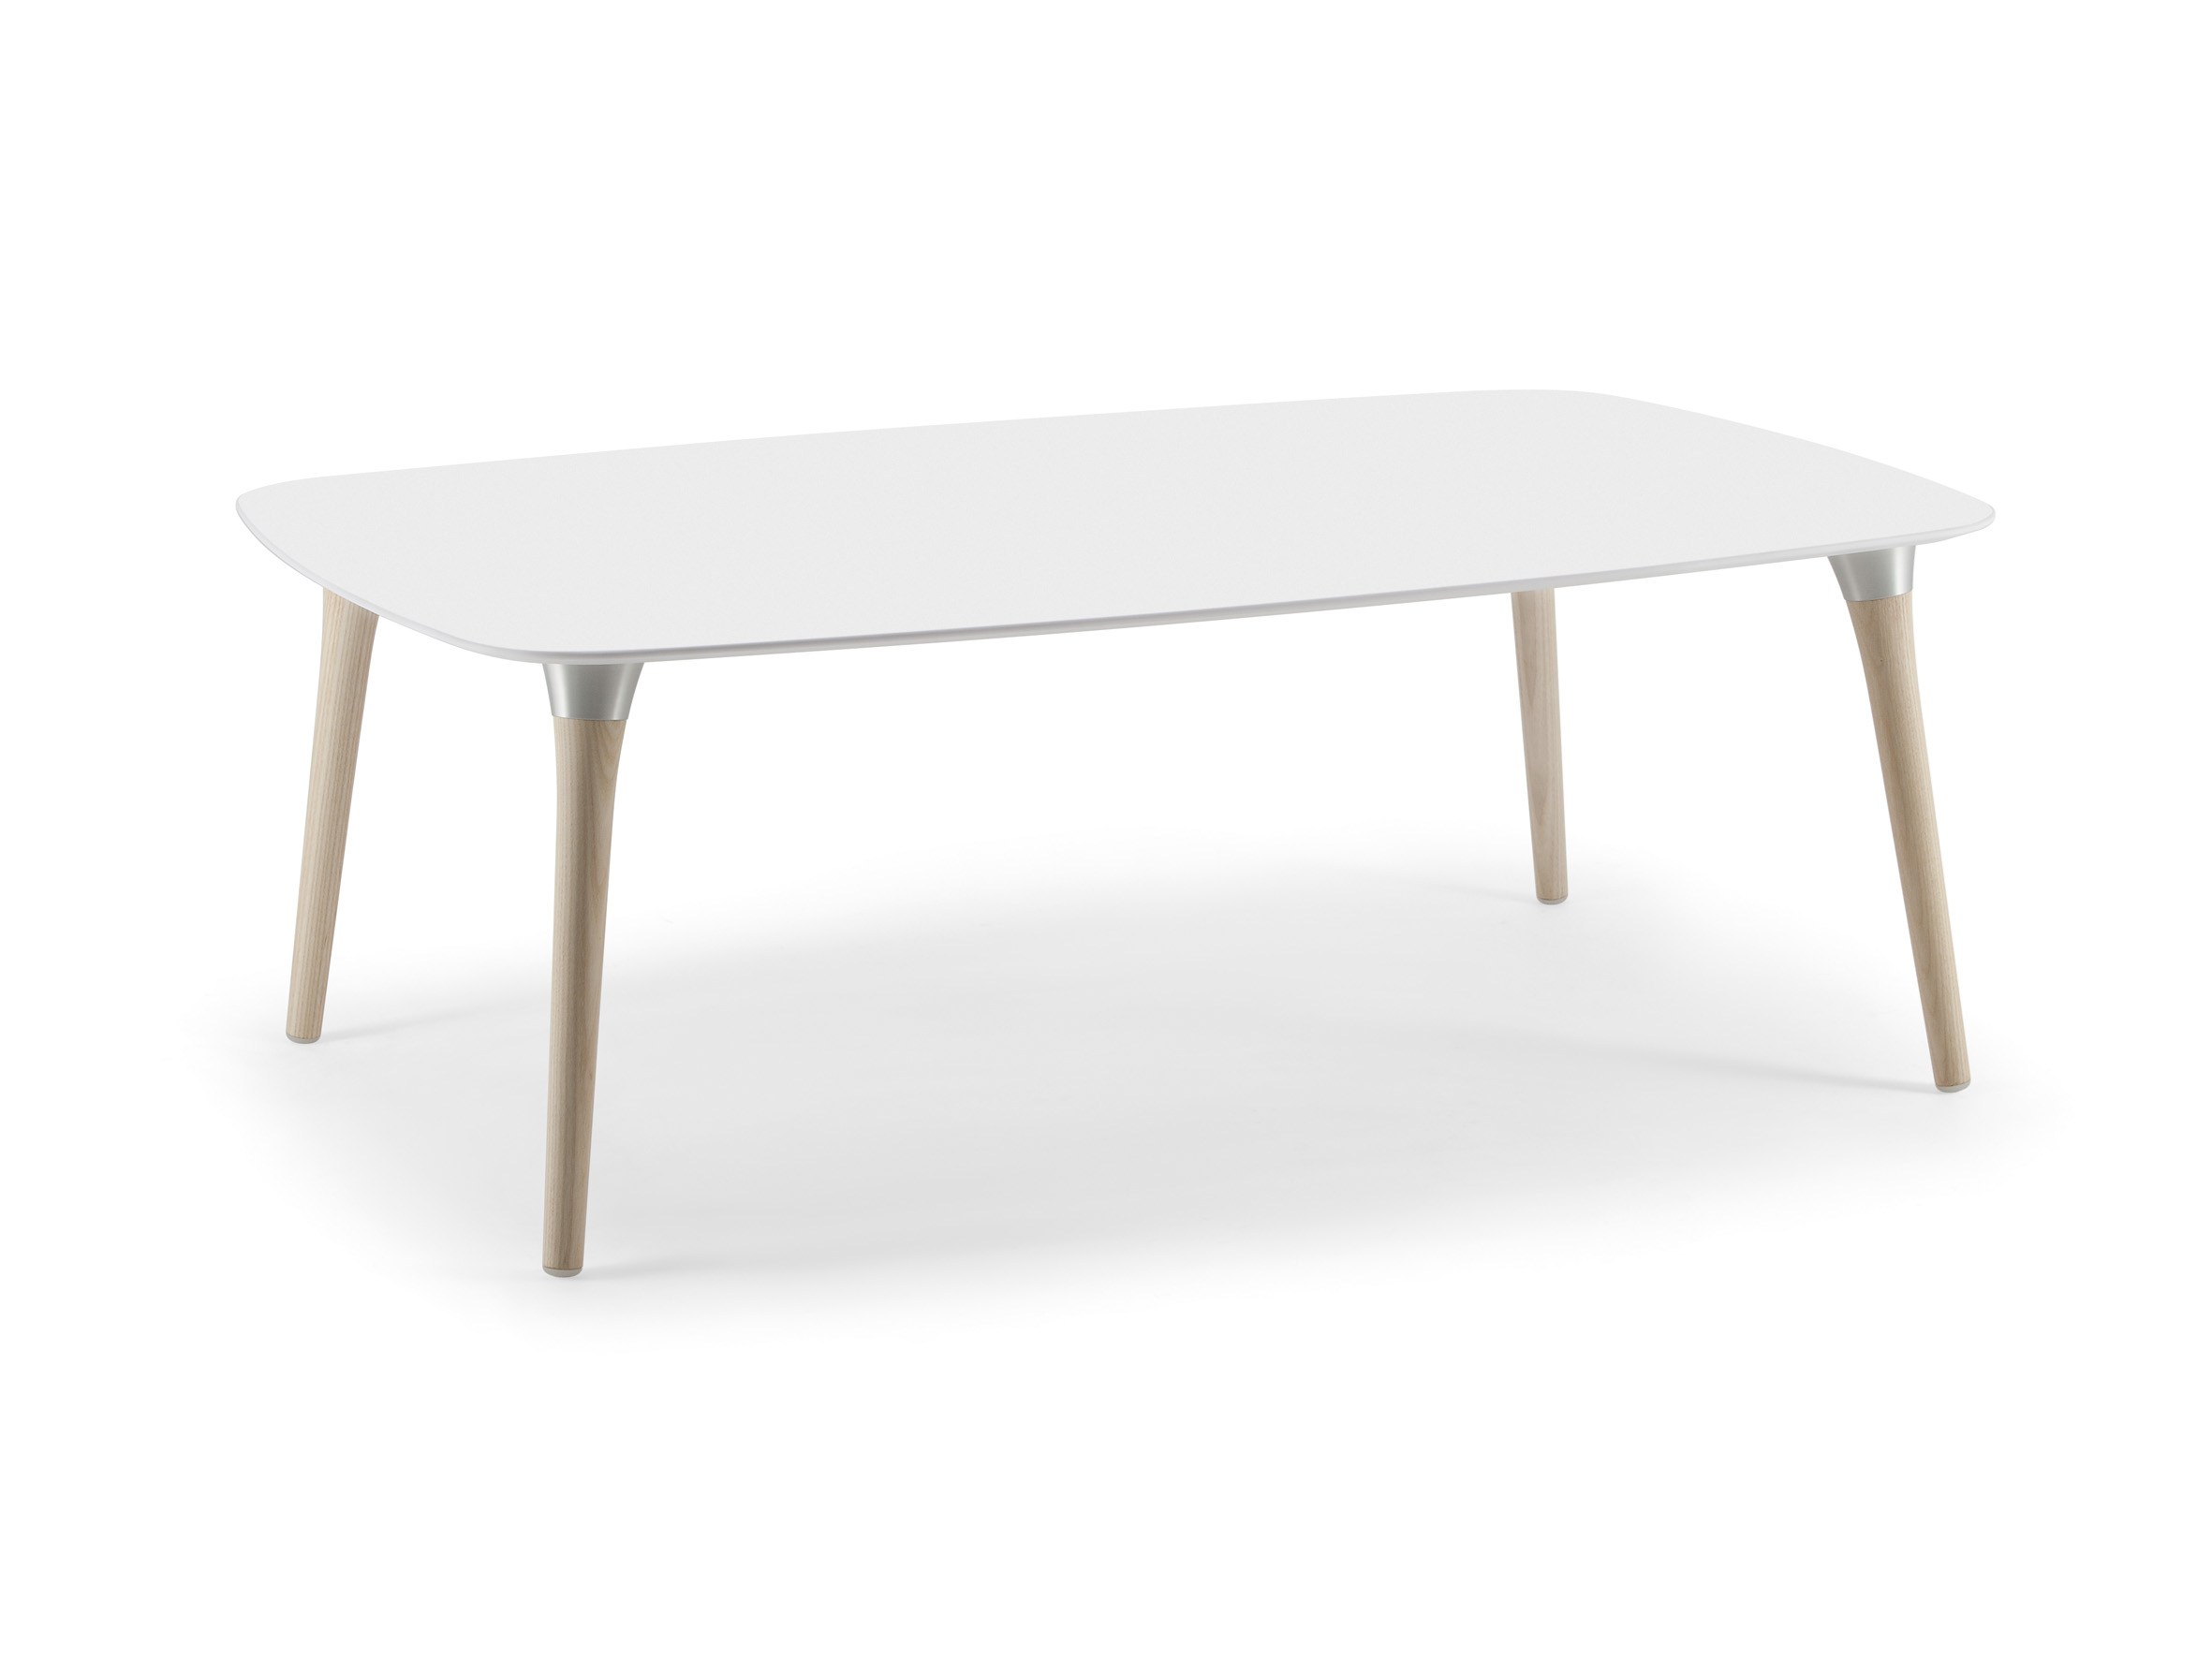 table basse rectangulaire de salon spring collection premium by cizeta design edi e paolo. Black Bedroom Furniture Sets. Home Design Ideas